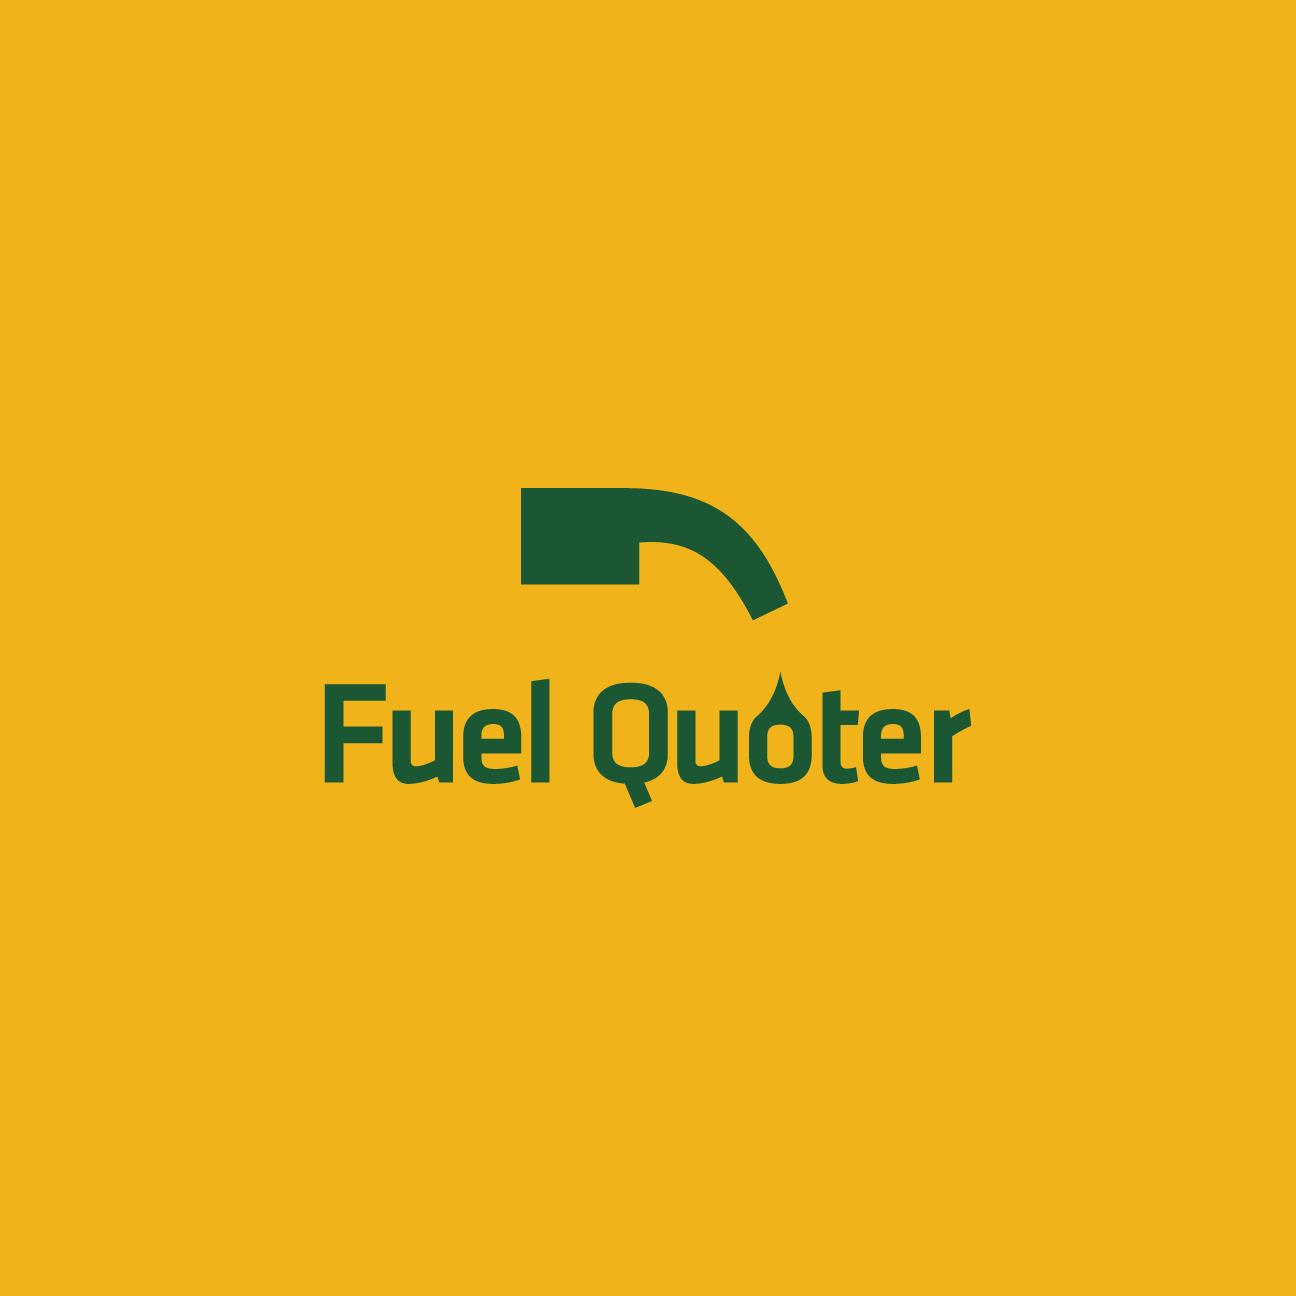 Fuel Quoter Logo